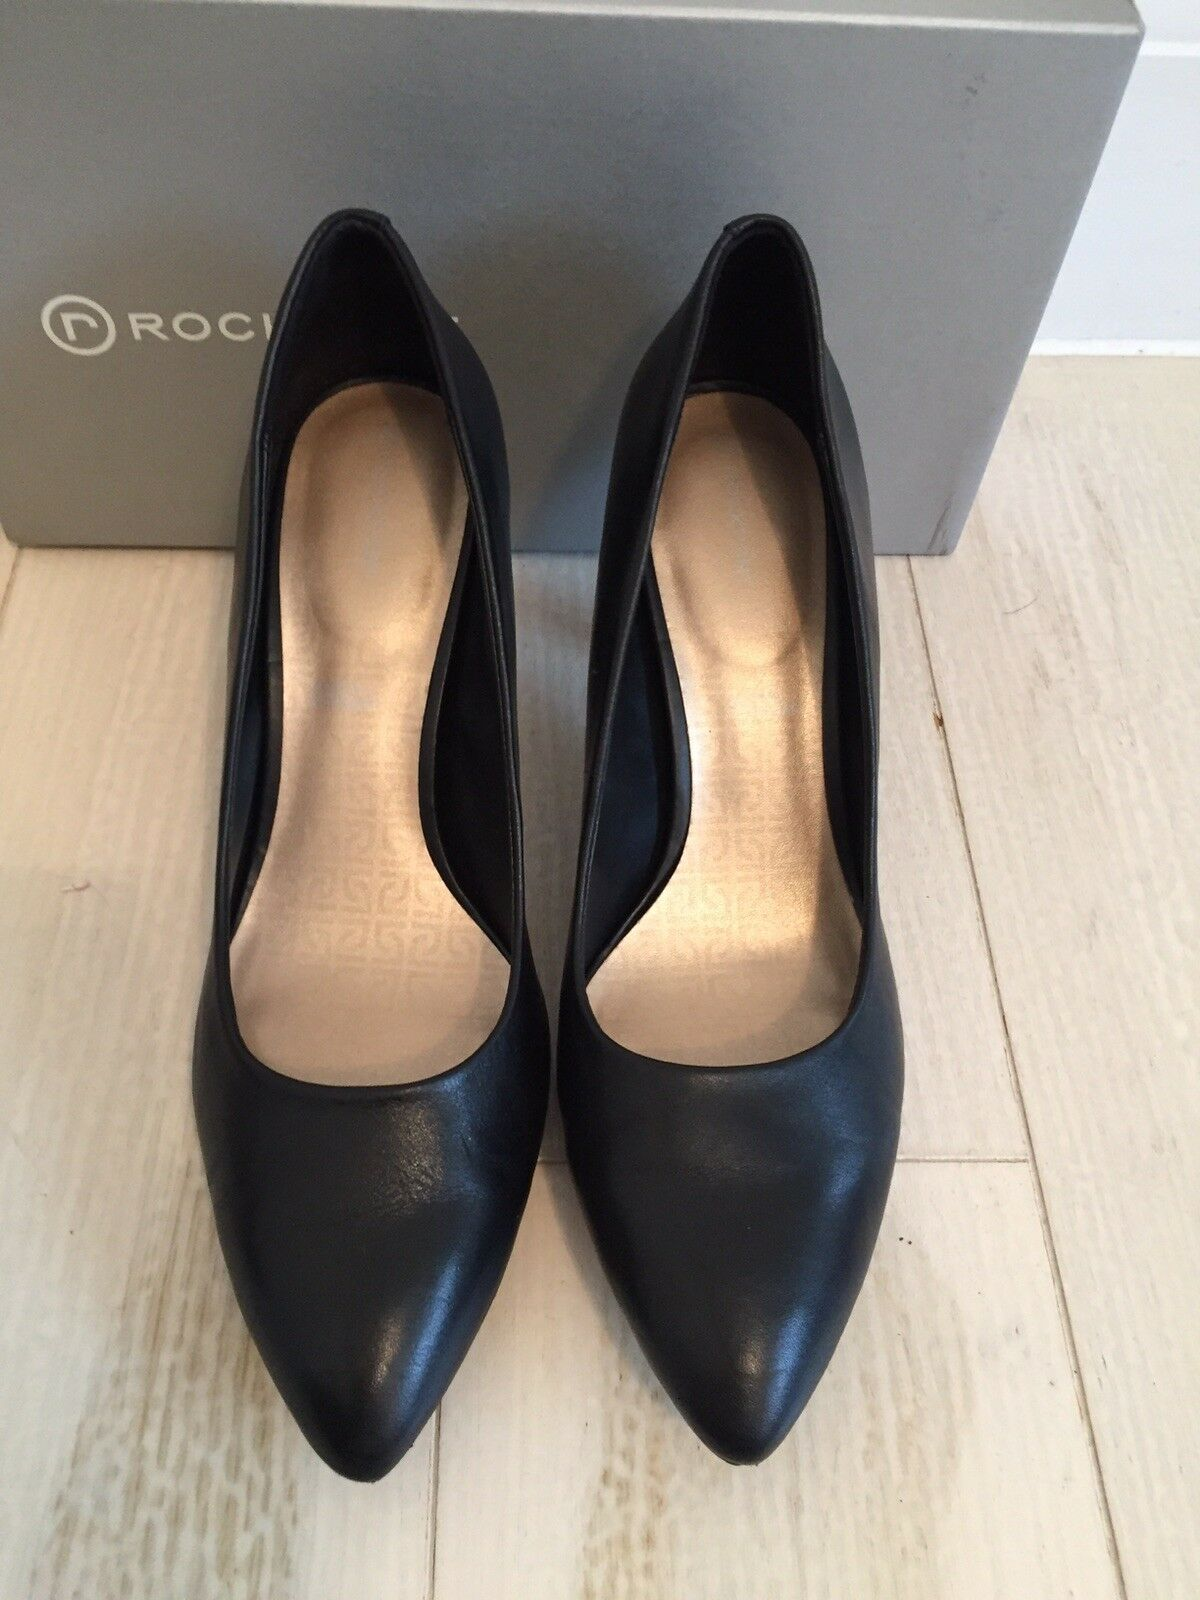 Rock Sport Noir Royaume-Uni 7, Euro 41, Large, Femme Femme Femme Confortable Chaussures fb8af2